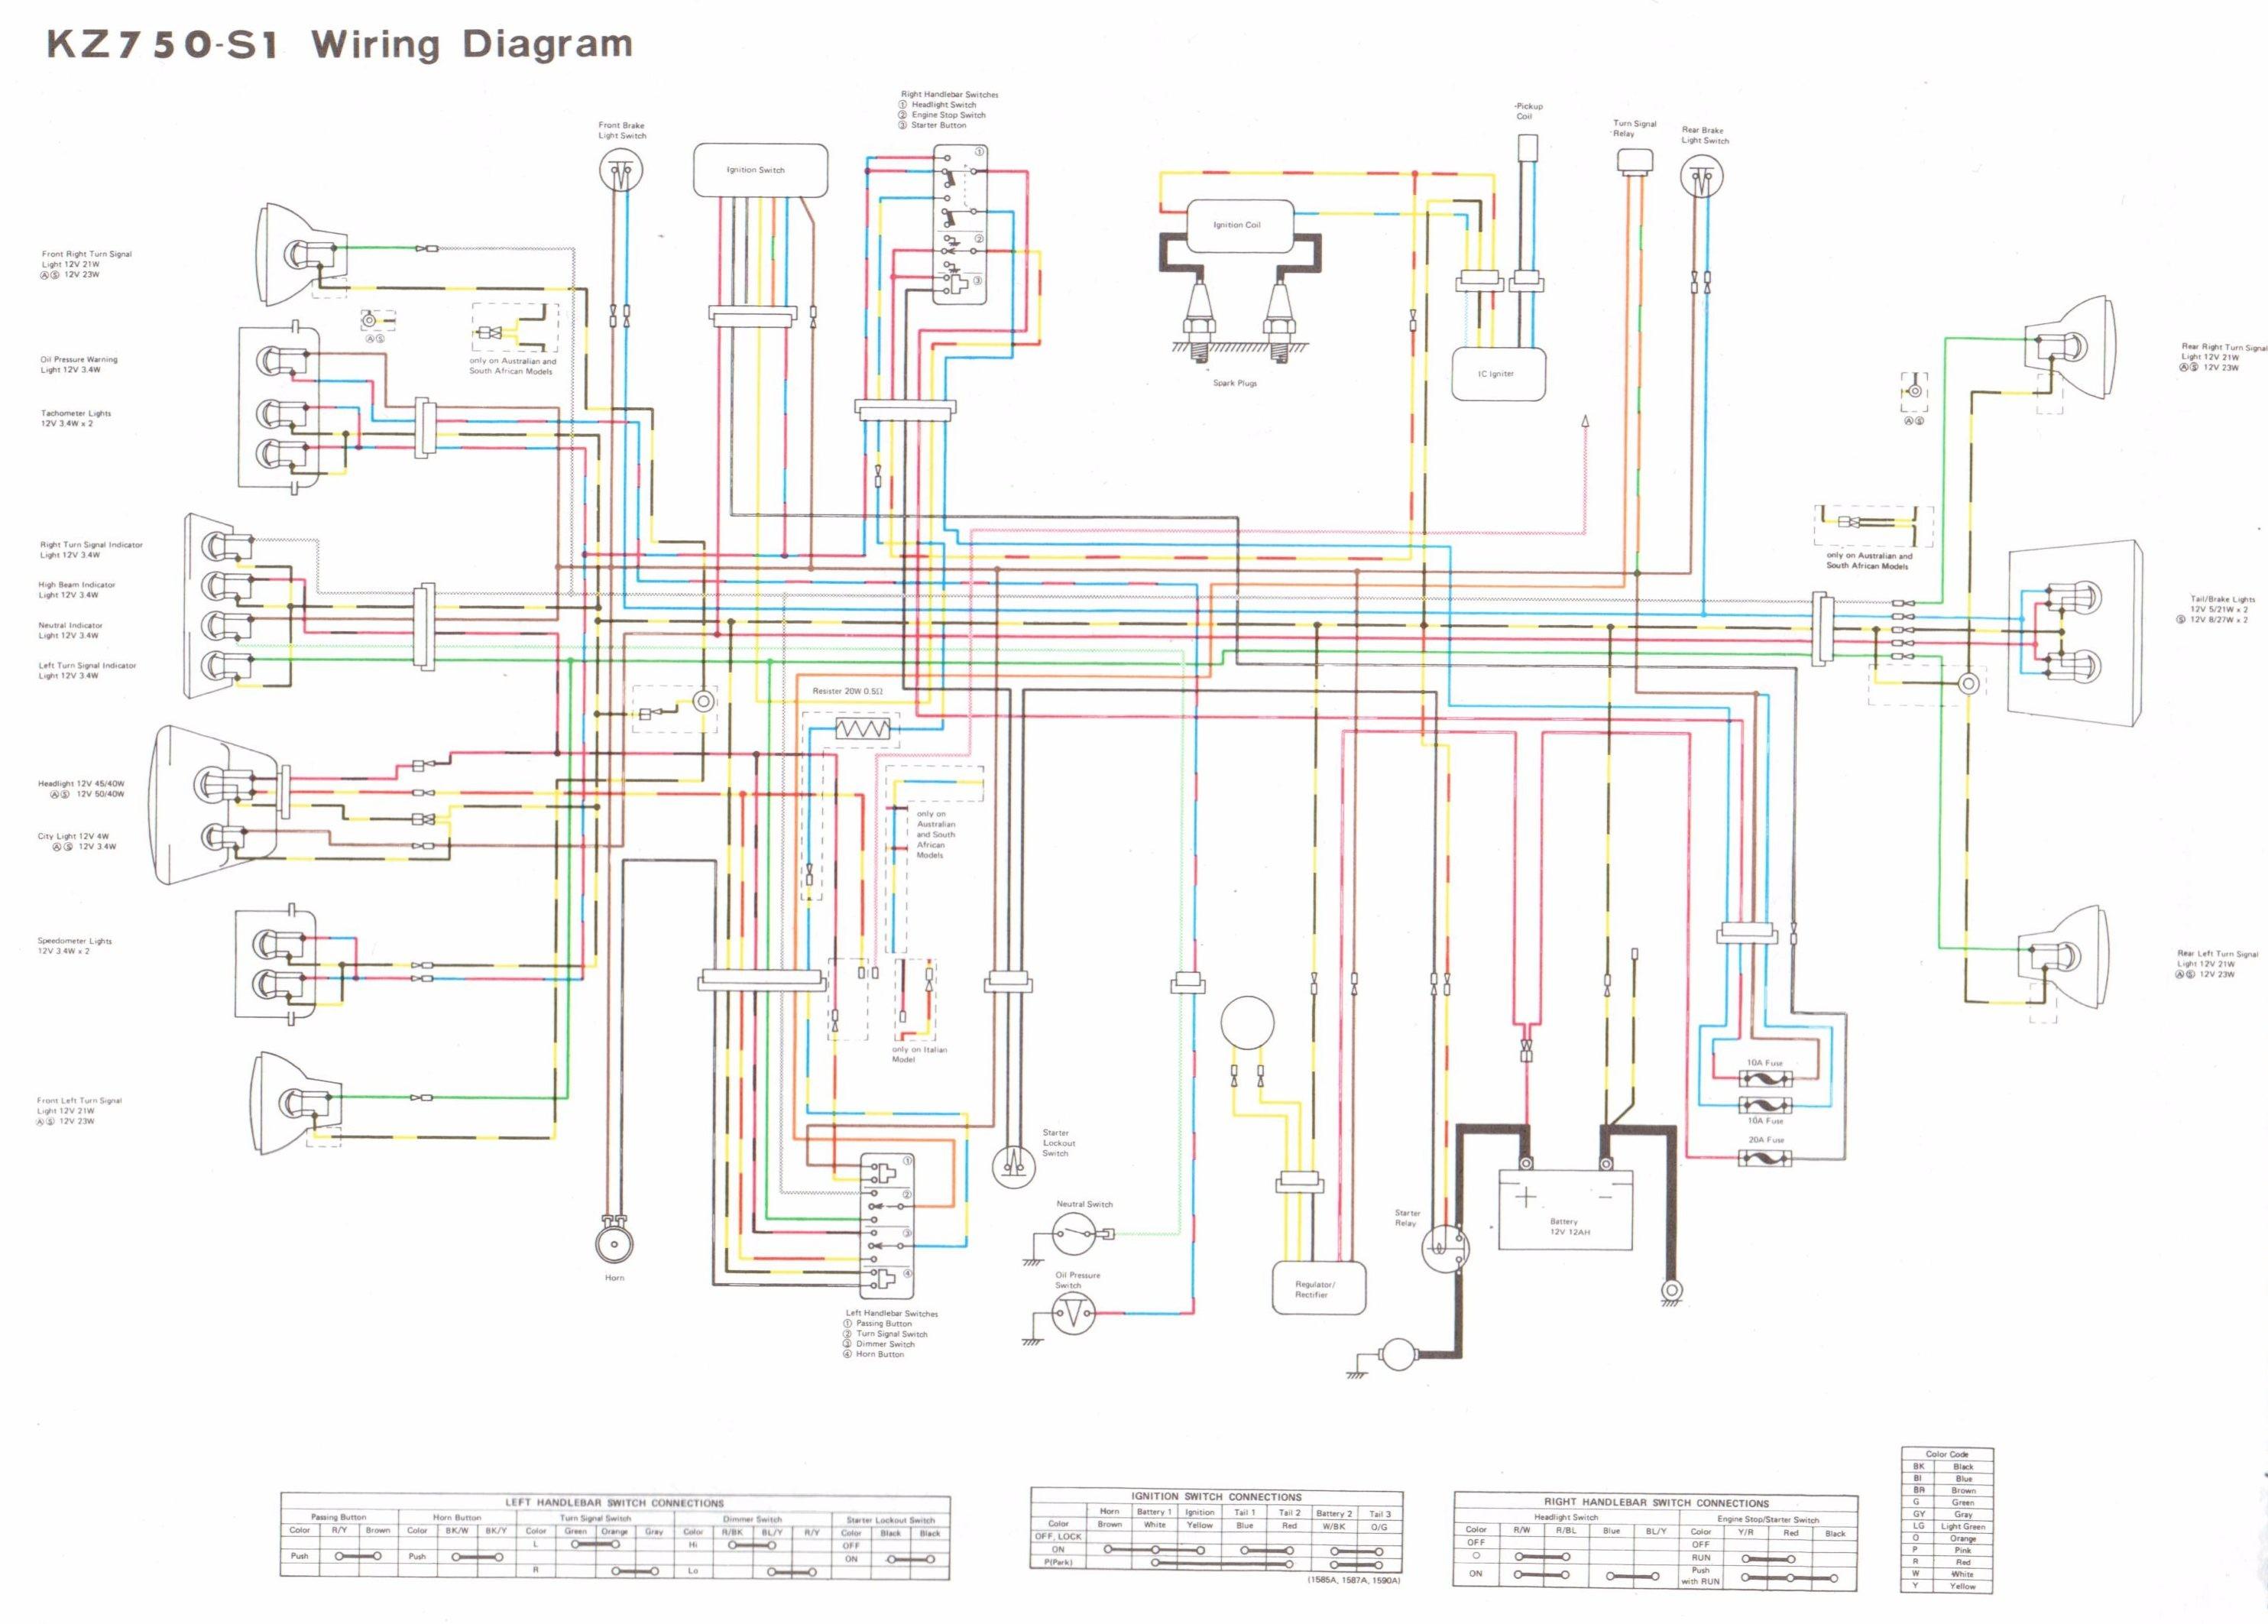 Lmu1230ma Manual Diagram] Renault Media Nav Evolution User Wiring Diagram Of Lmu1230ma Manual